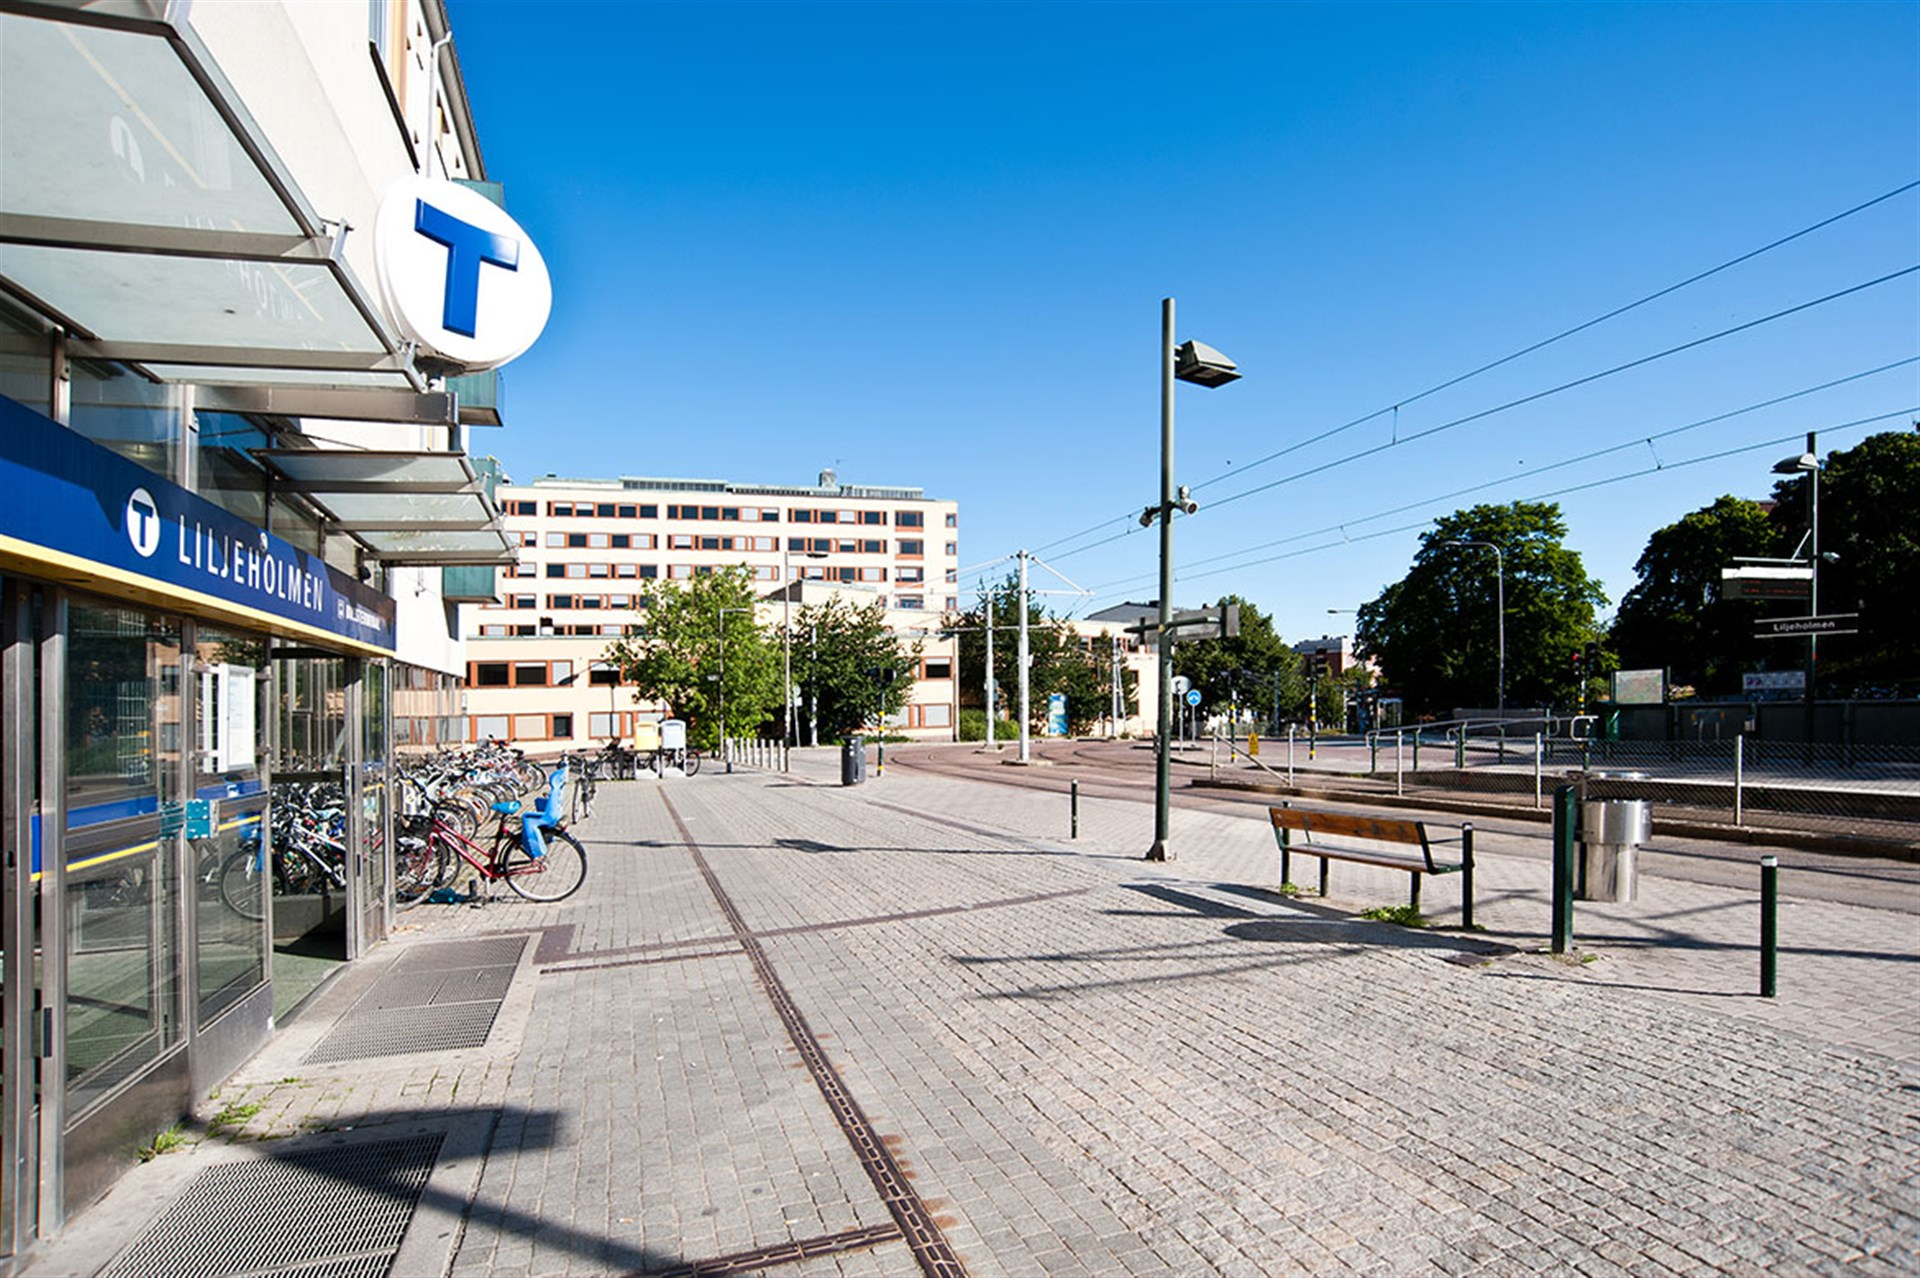 Tunnelbanan på Liljeholmstorget.